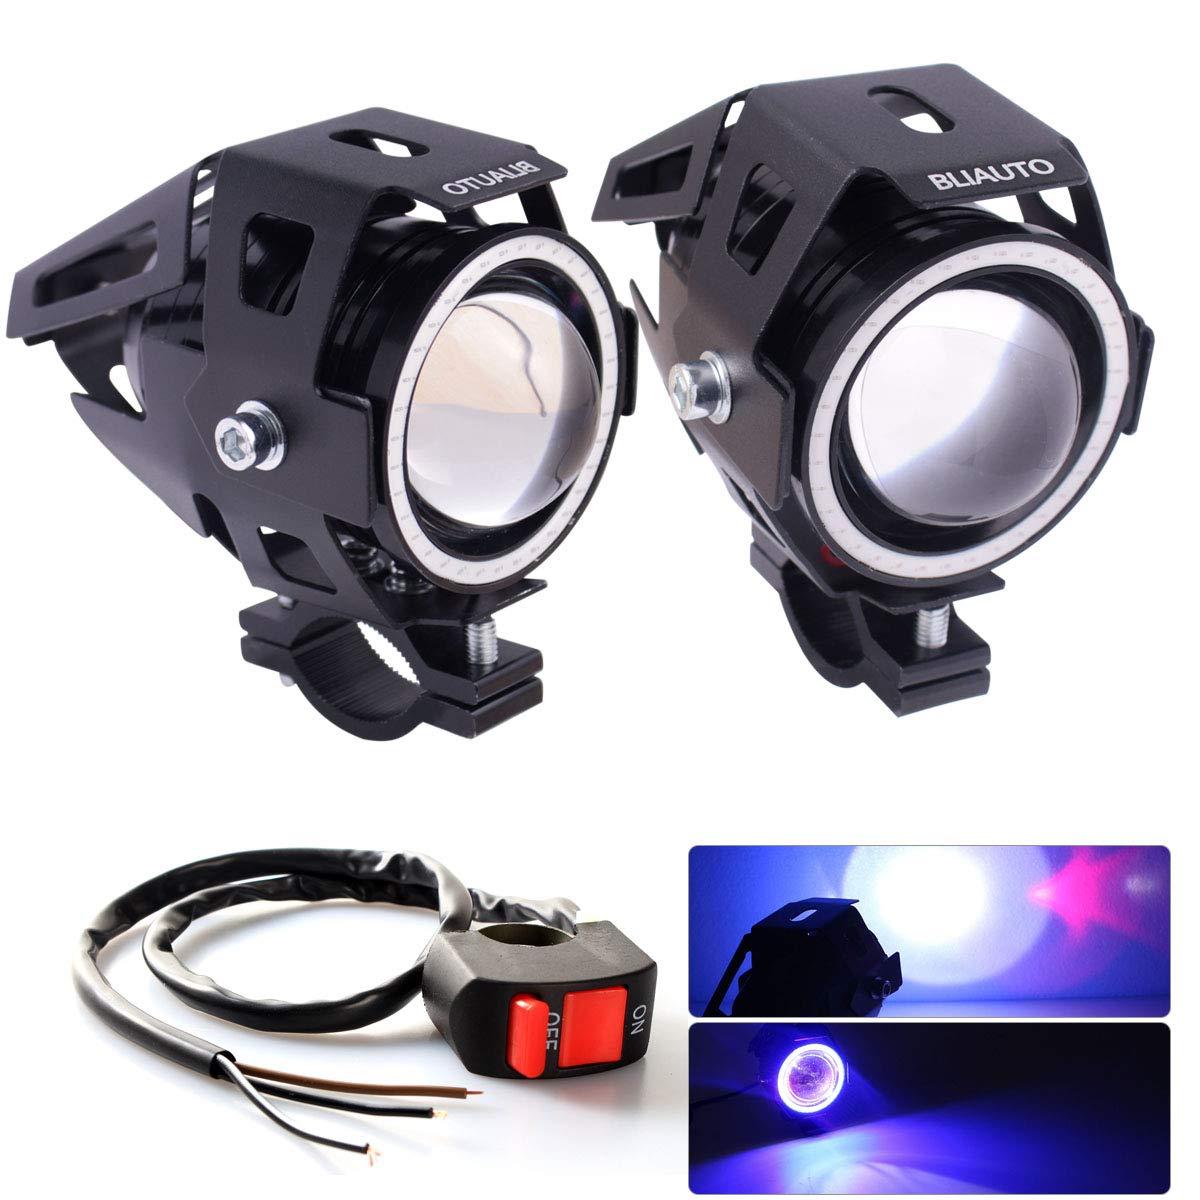 BLIAUTO Motorcycle LED Headlight U7 Cree Driving Fog Running Lights DRL Universal Front Spot Halo Ring Work Light Lamp for ATV UTV Trucks Hi//Lo Beam with Switch 2PCS, Blue Angle Eye